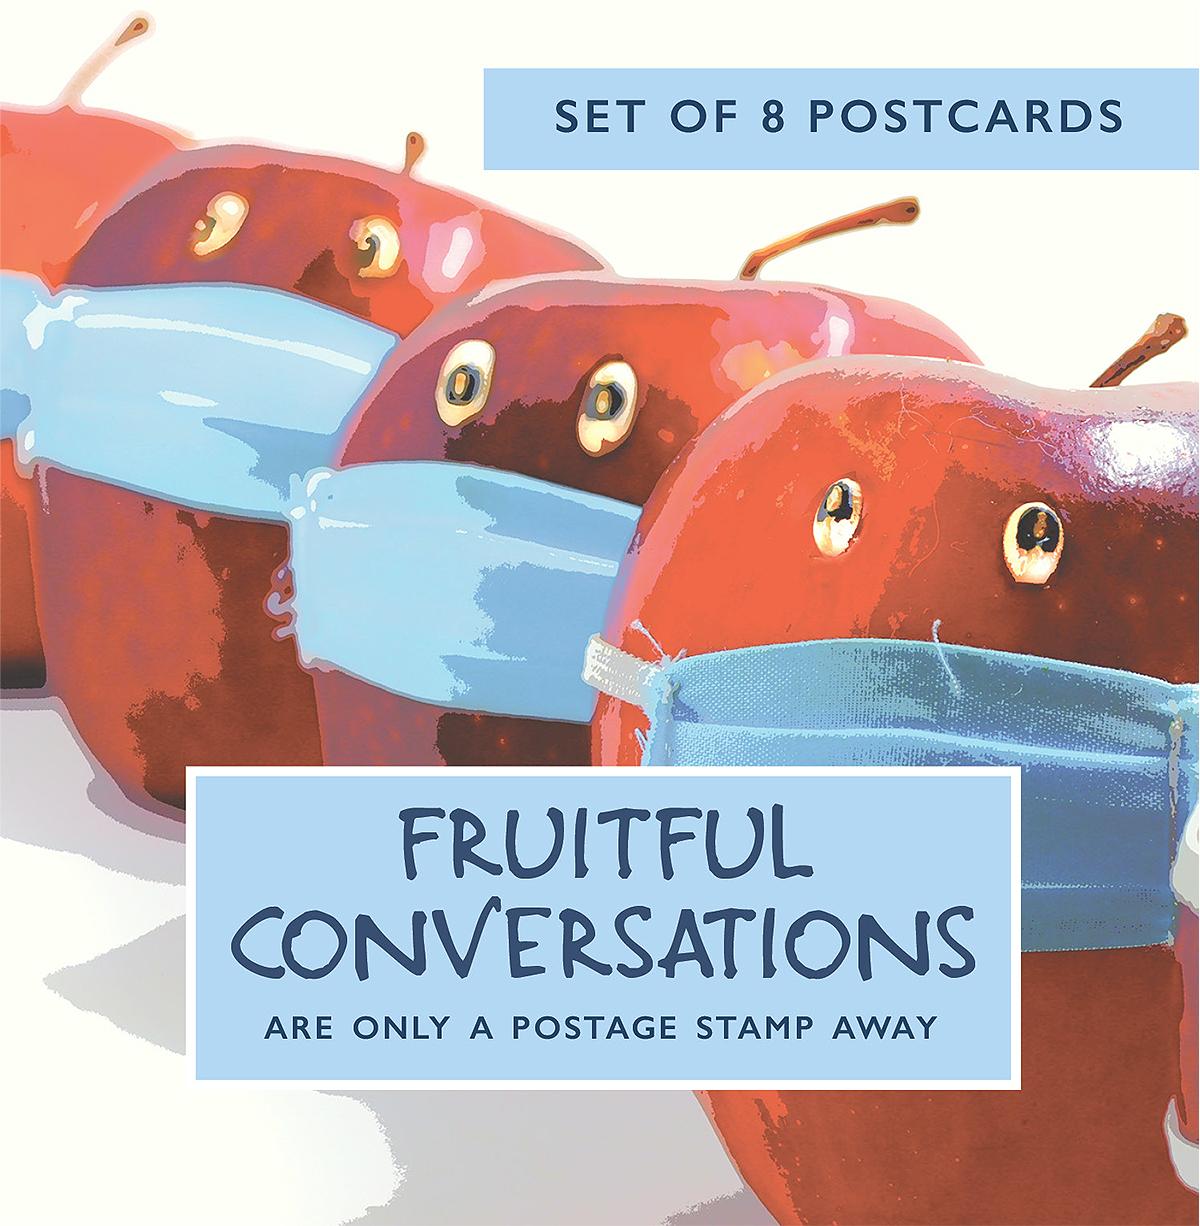 Fruitful Conversations Postcard Set Of 8